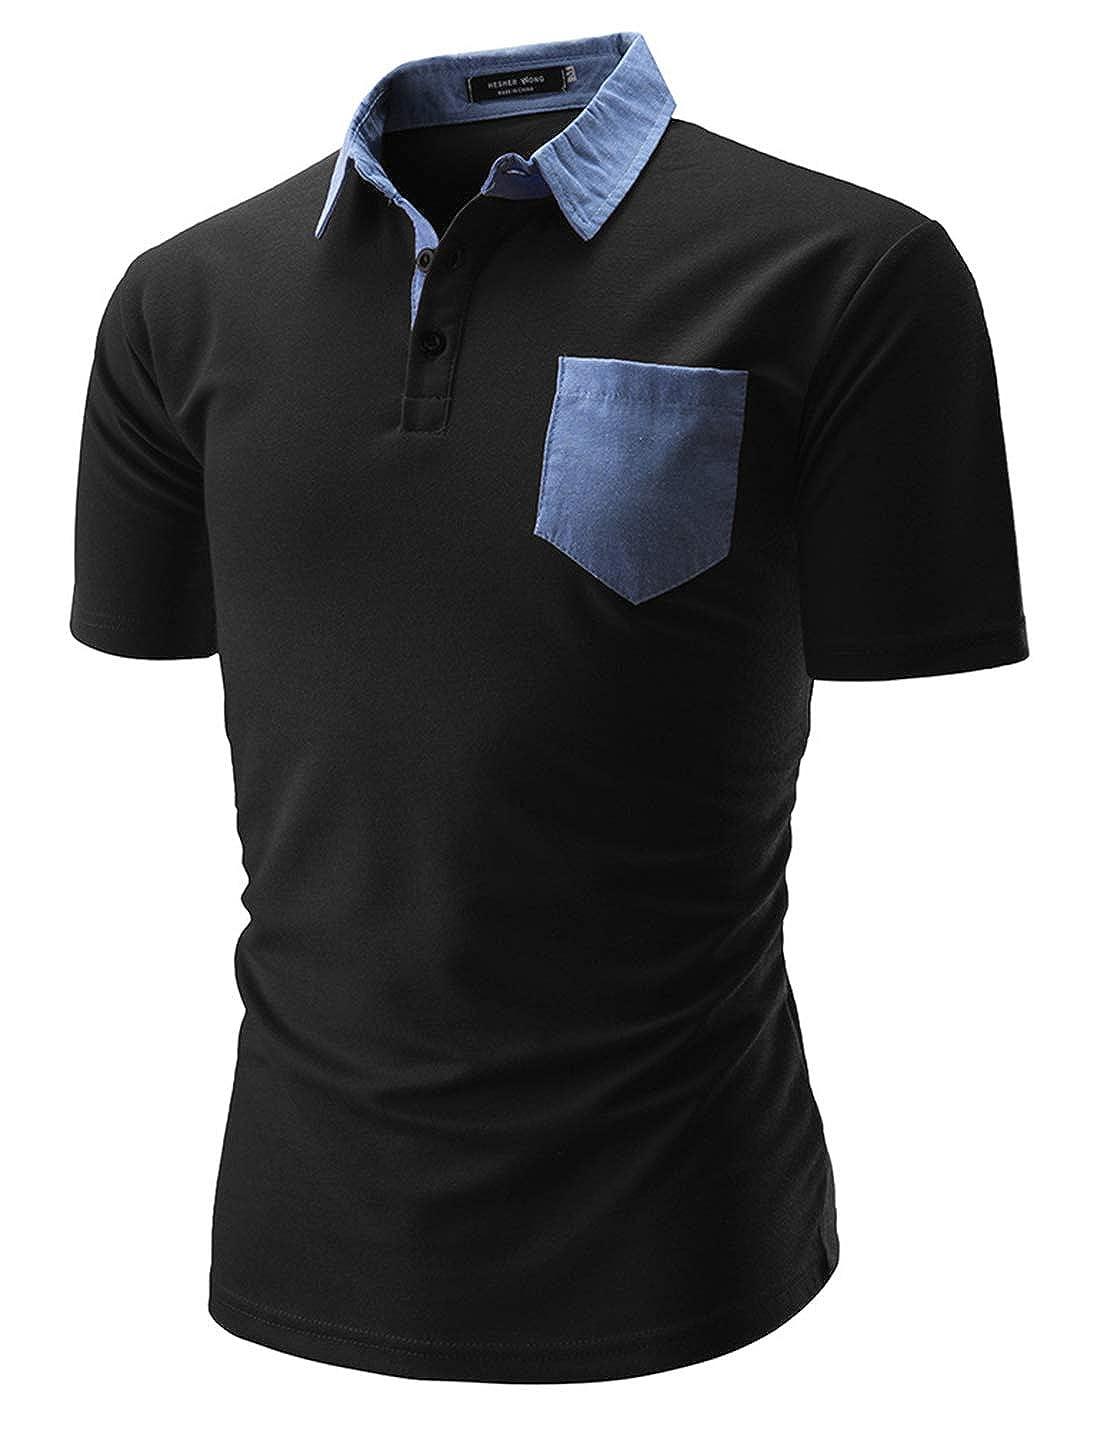 Springrain Mens Classic Slim Fit Short Sleeve Polo Shirt